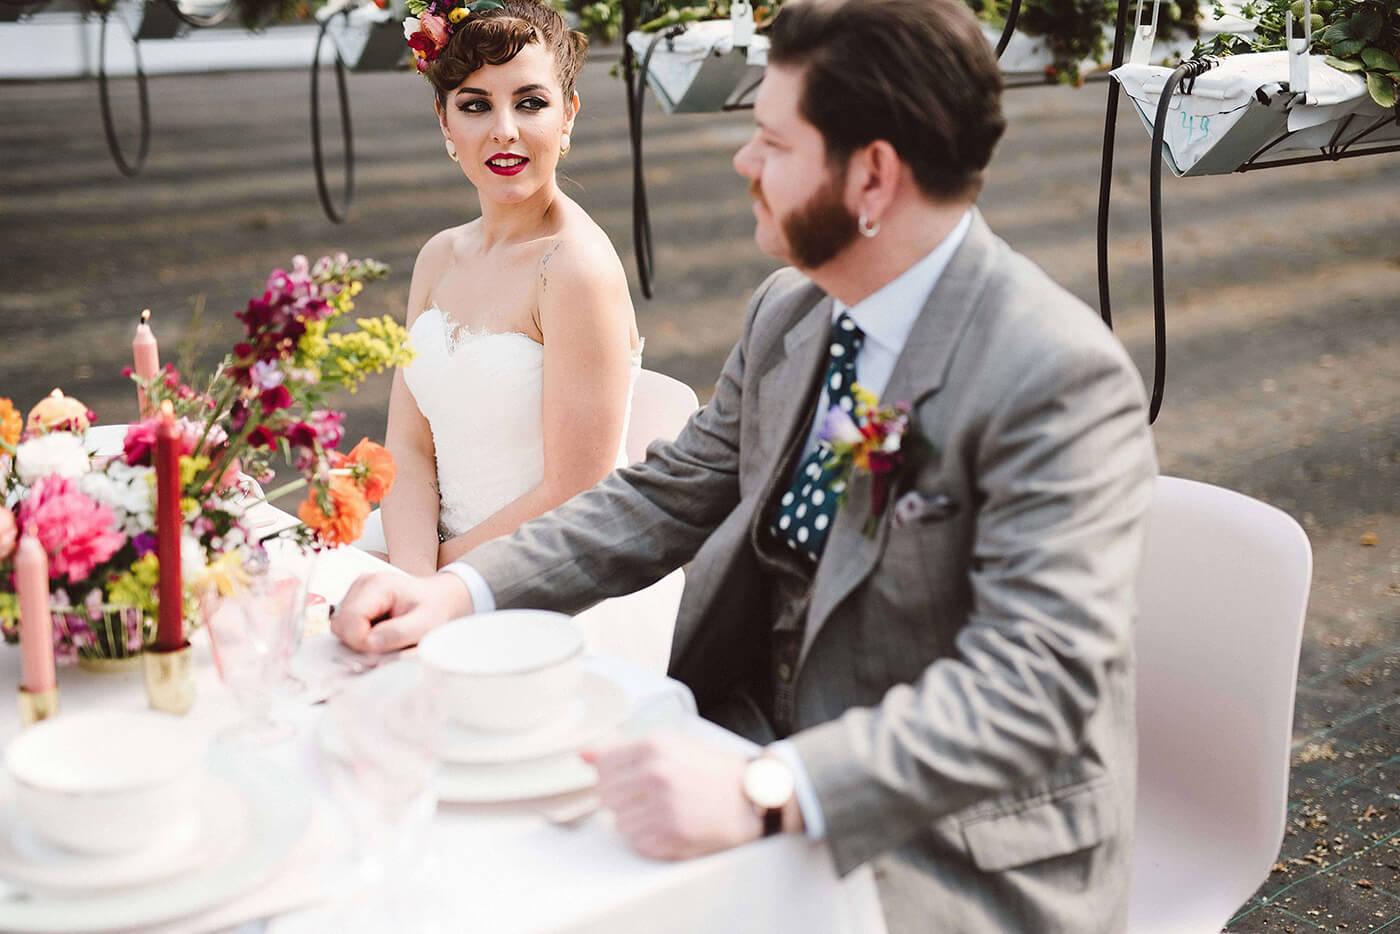 roma-organizacao-eventos-editorial-mid-century-modern-wedding-in-a-strawberry-field-18